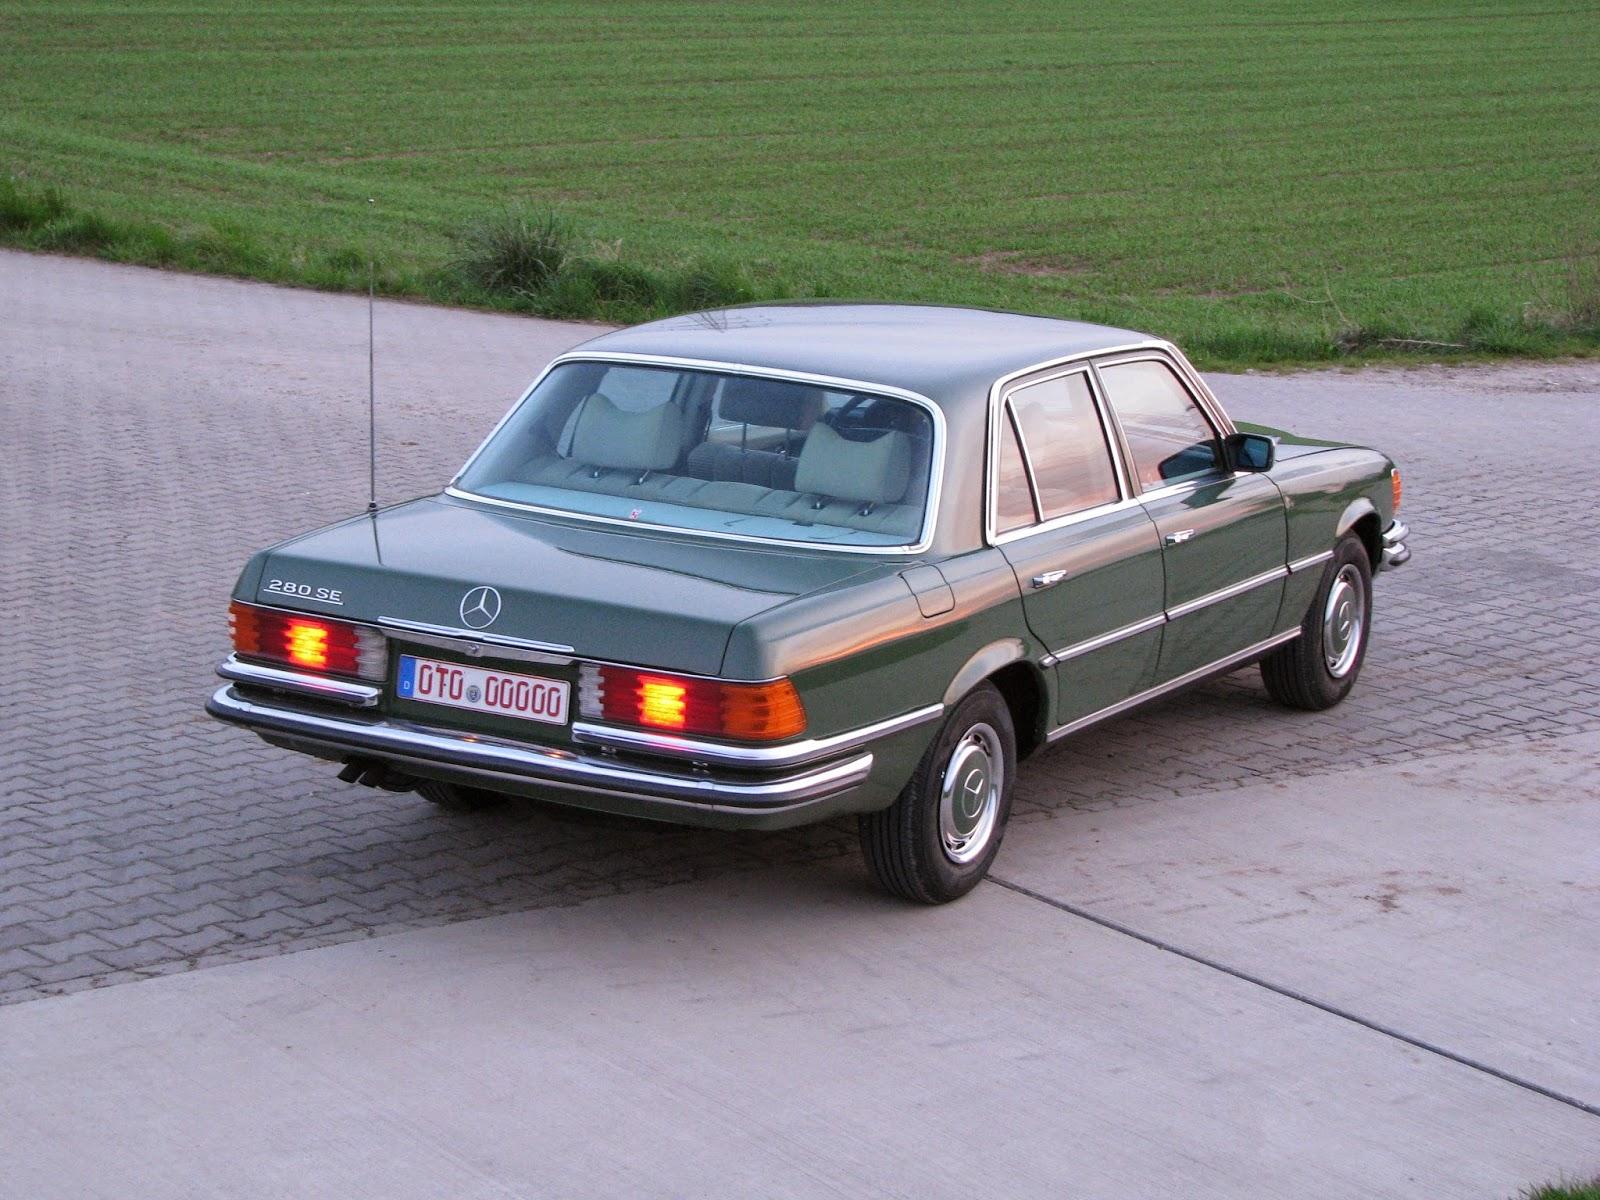 Mi blog de coches cl sicos mercedes benz 280 sel w116 for Mercedes benz rental pittsburgh